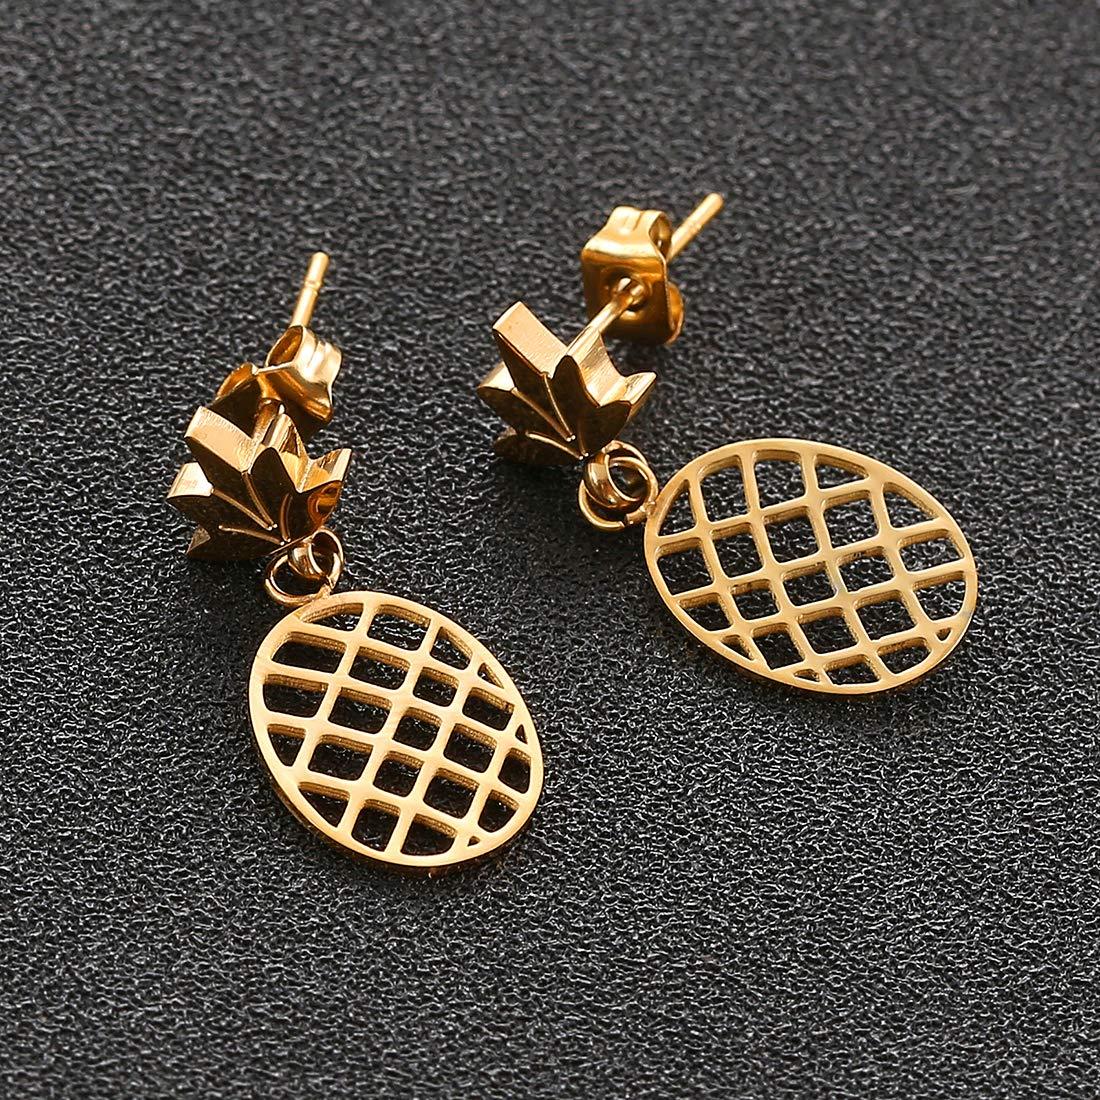 Earrings+Bracelets+Necklaces Jewelry Set SKQIR Womens Stainless Steel Pineapple Jewelry Sets